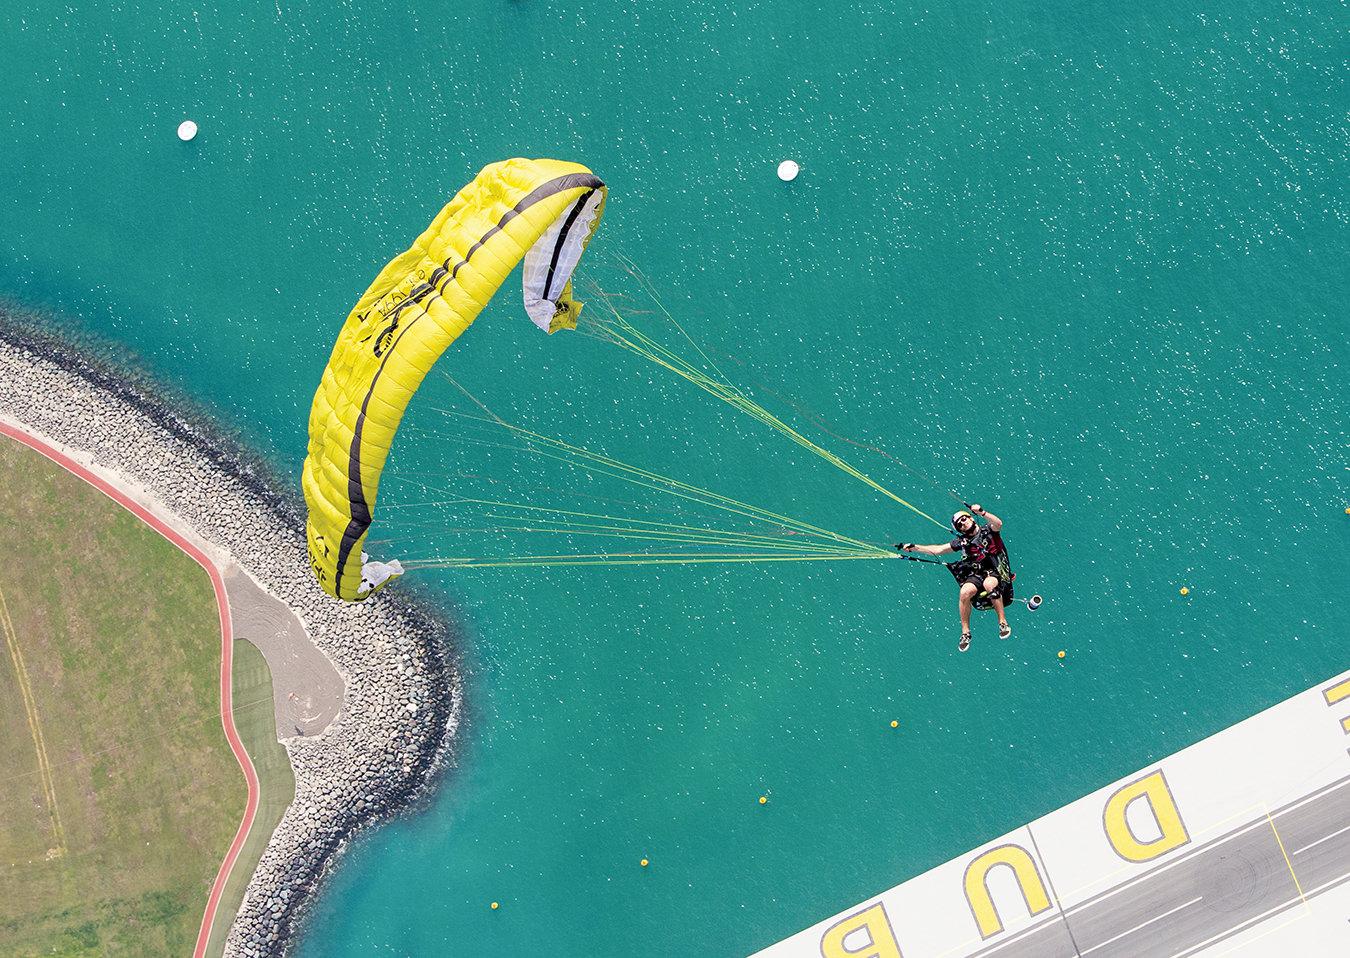 NUVO Summer 2016: Canada's Star Aerobatic Paraglider David Thibodeau, Inquiring Minds